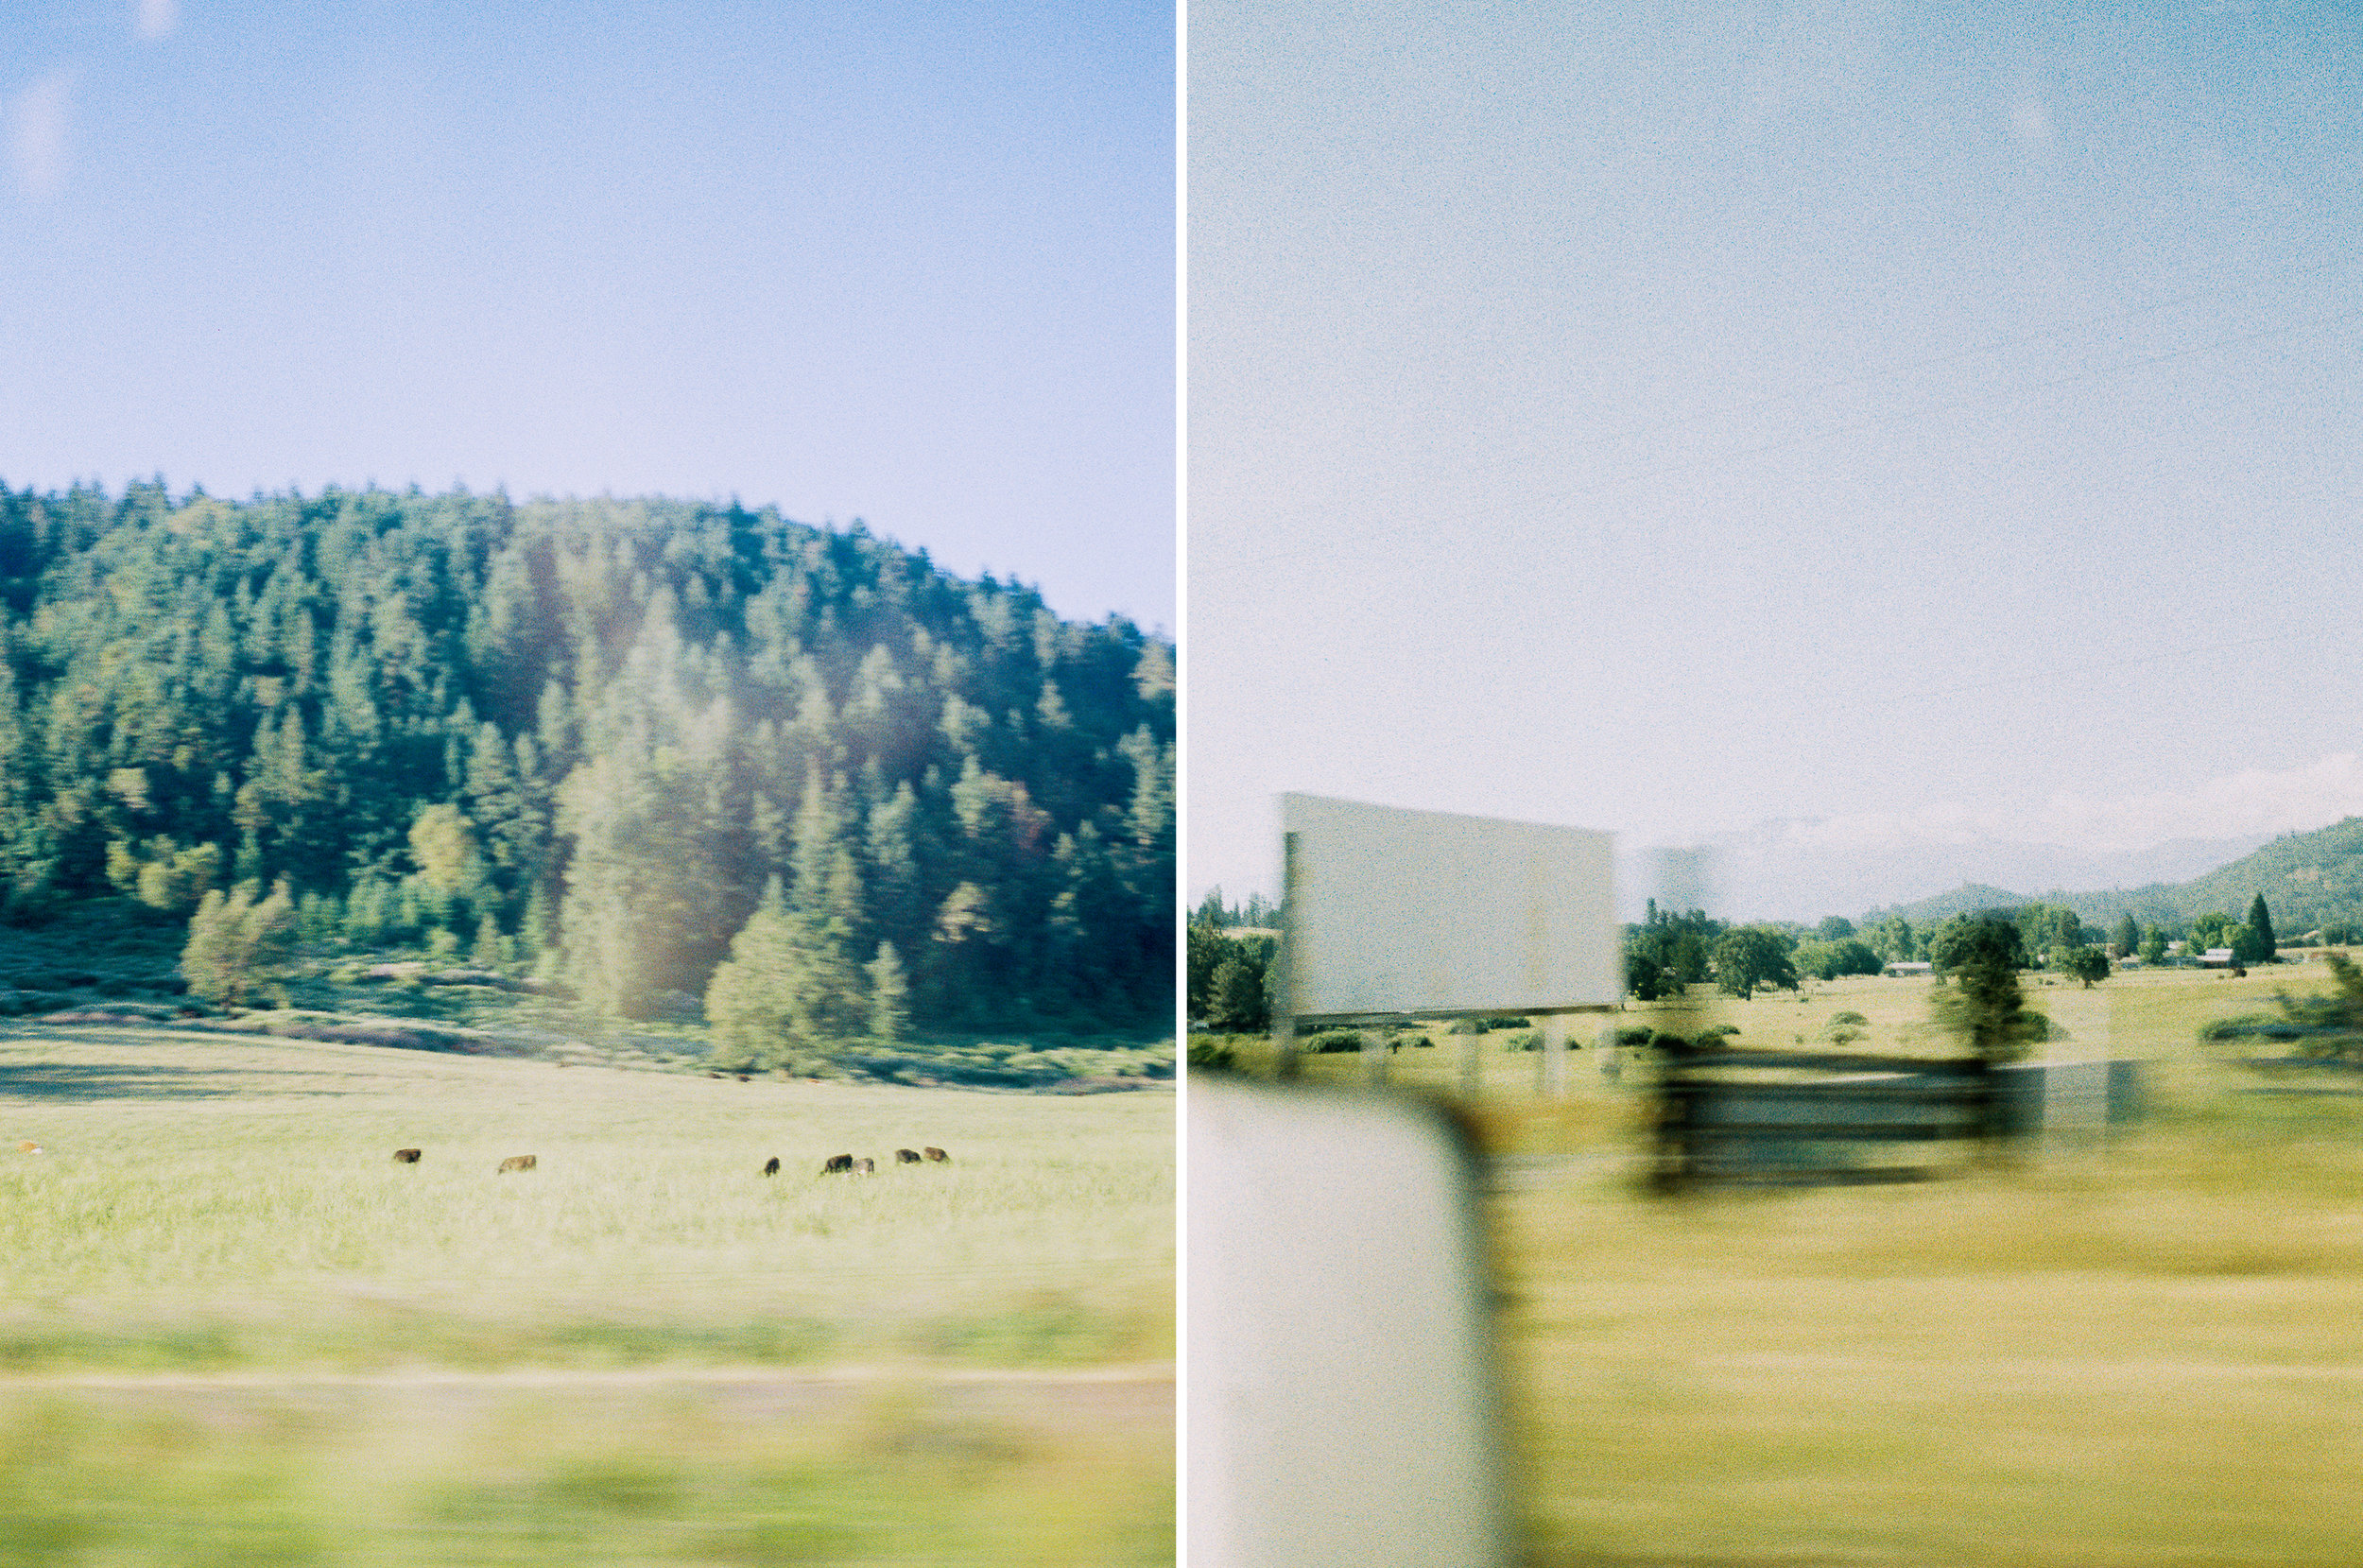 road-trip-portland-to-la-1.jpg